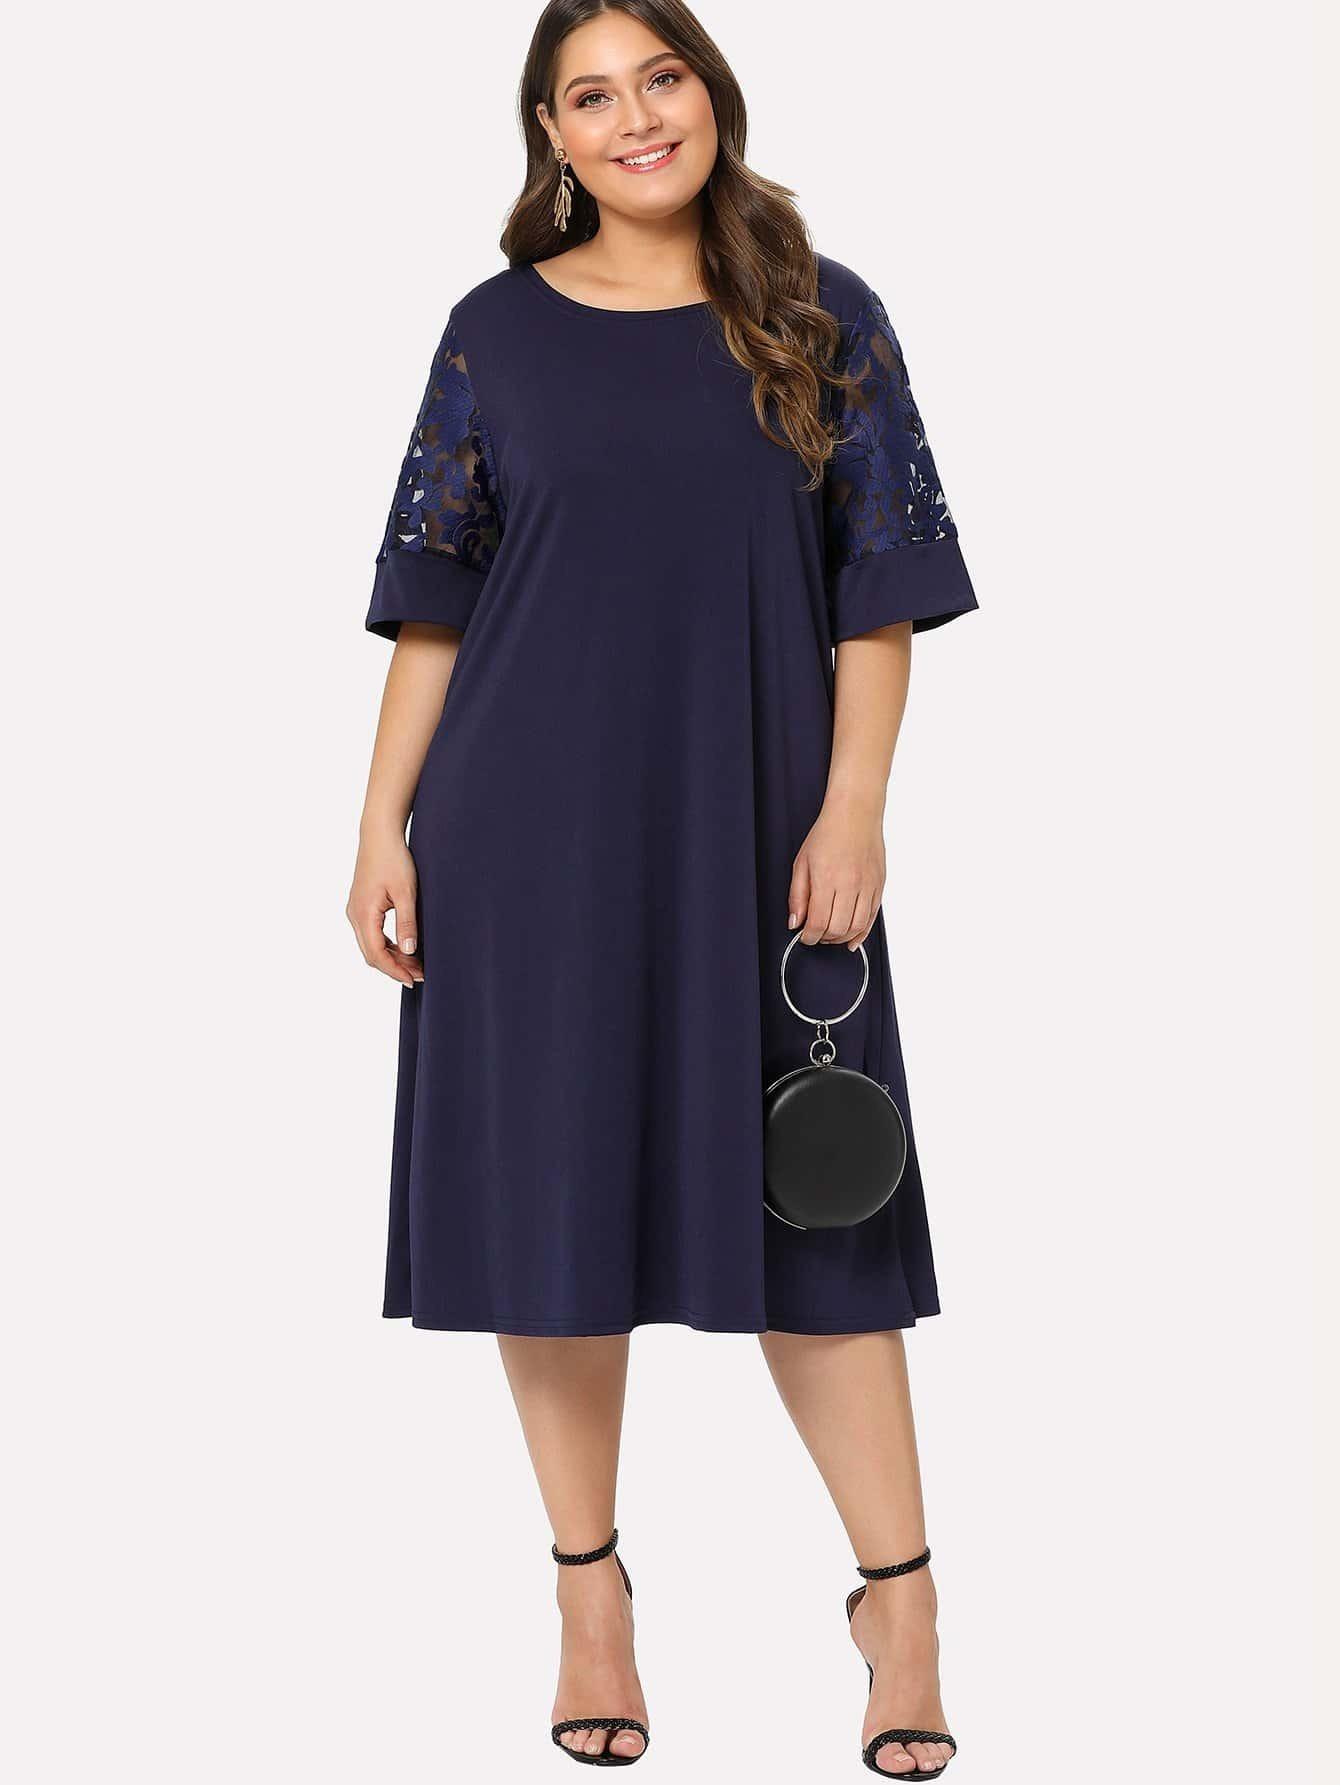 Plus Mesh Panel Sleeve Dress mesh panel sleeve dress